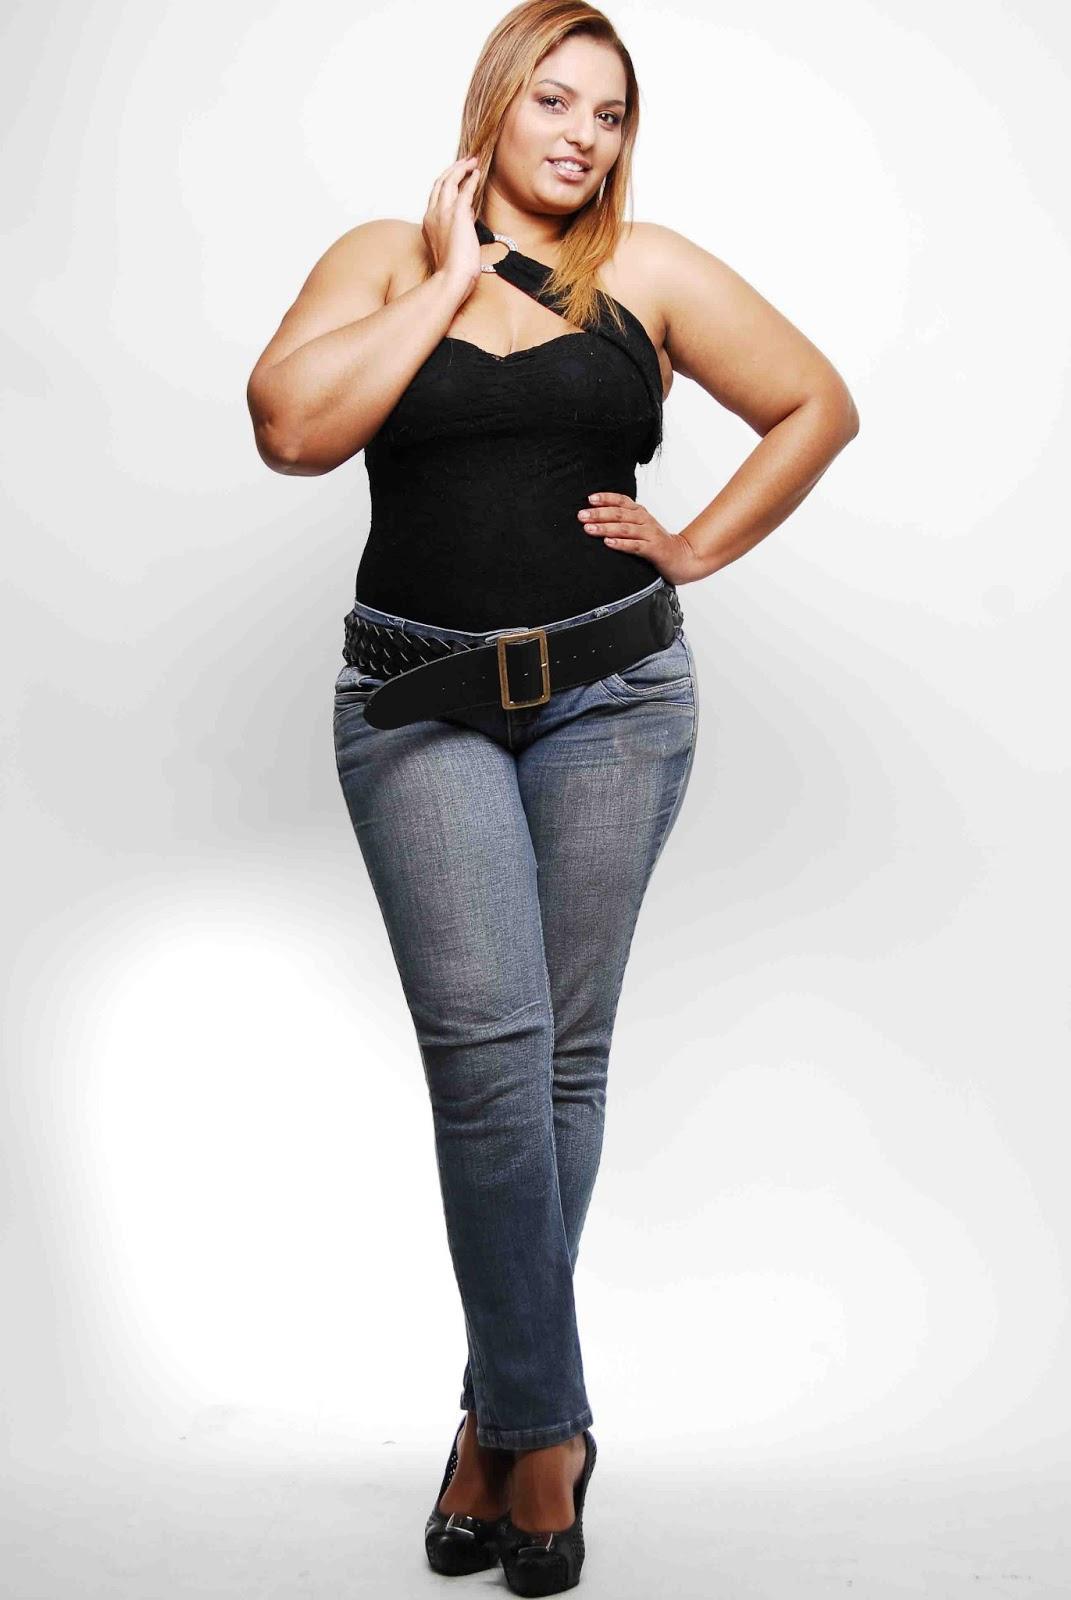 Procuramos mulheres gordas encontro 21832